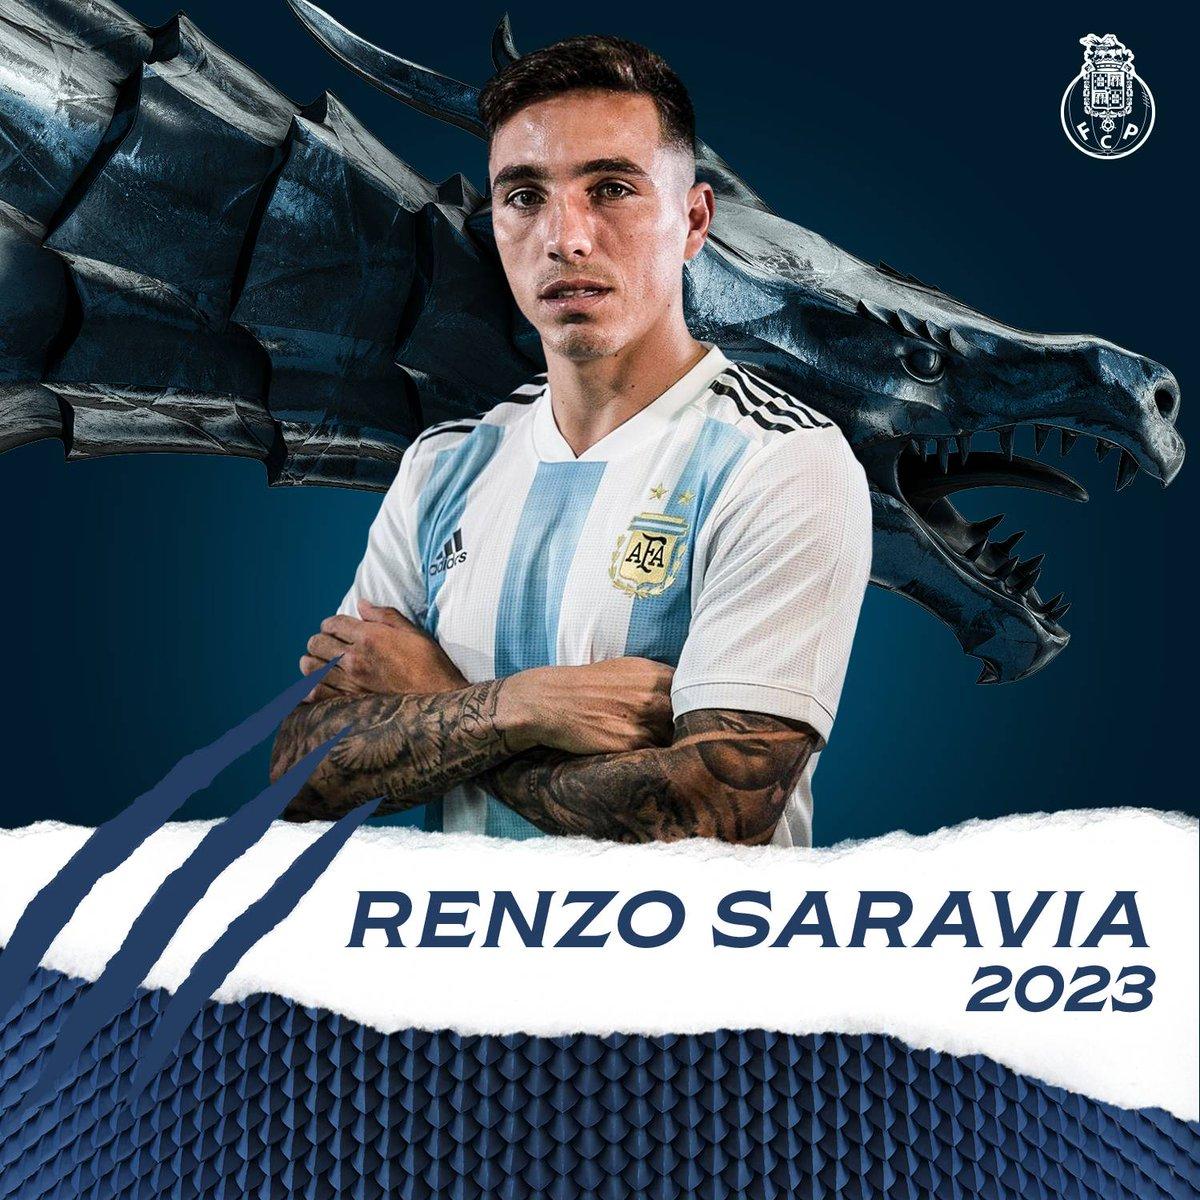 Renzo Saravia